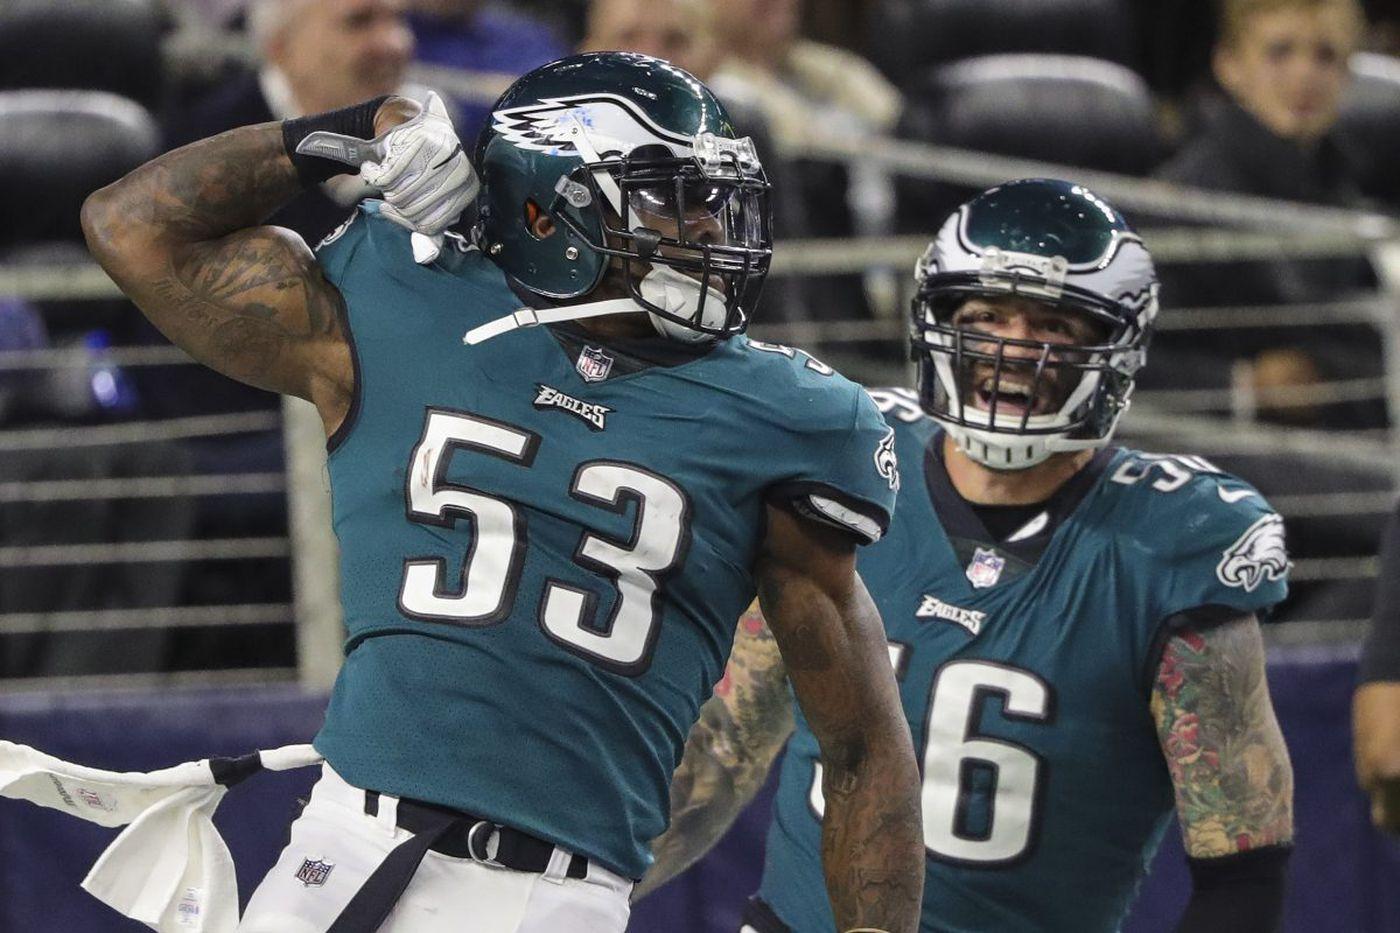 Eagles 37, Cowboys 9 - as it happened